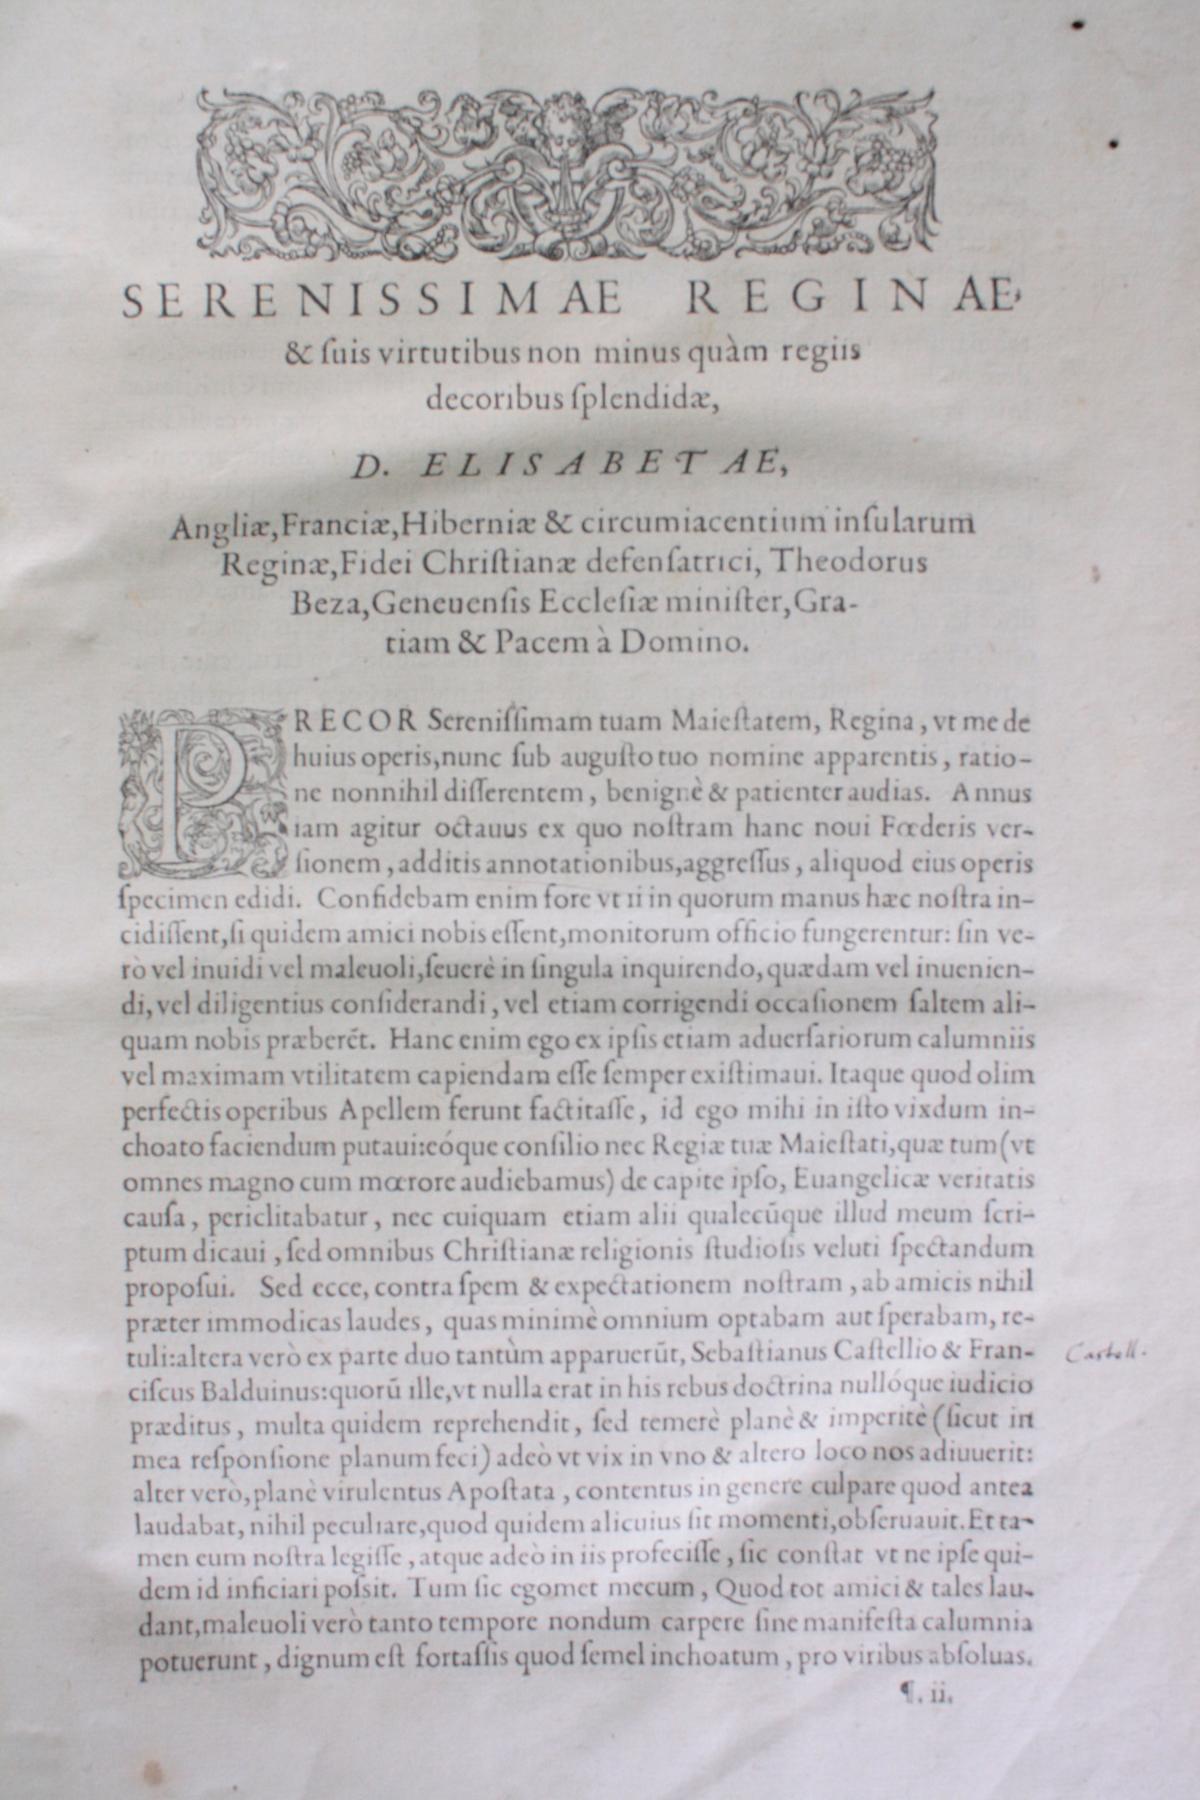 Griechische-Lateinische Bibel, Novum Testamentum 1582-6